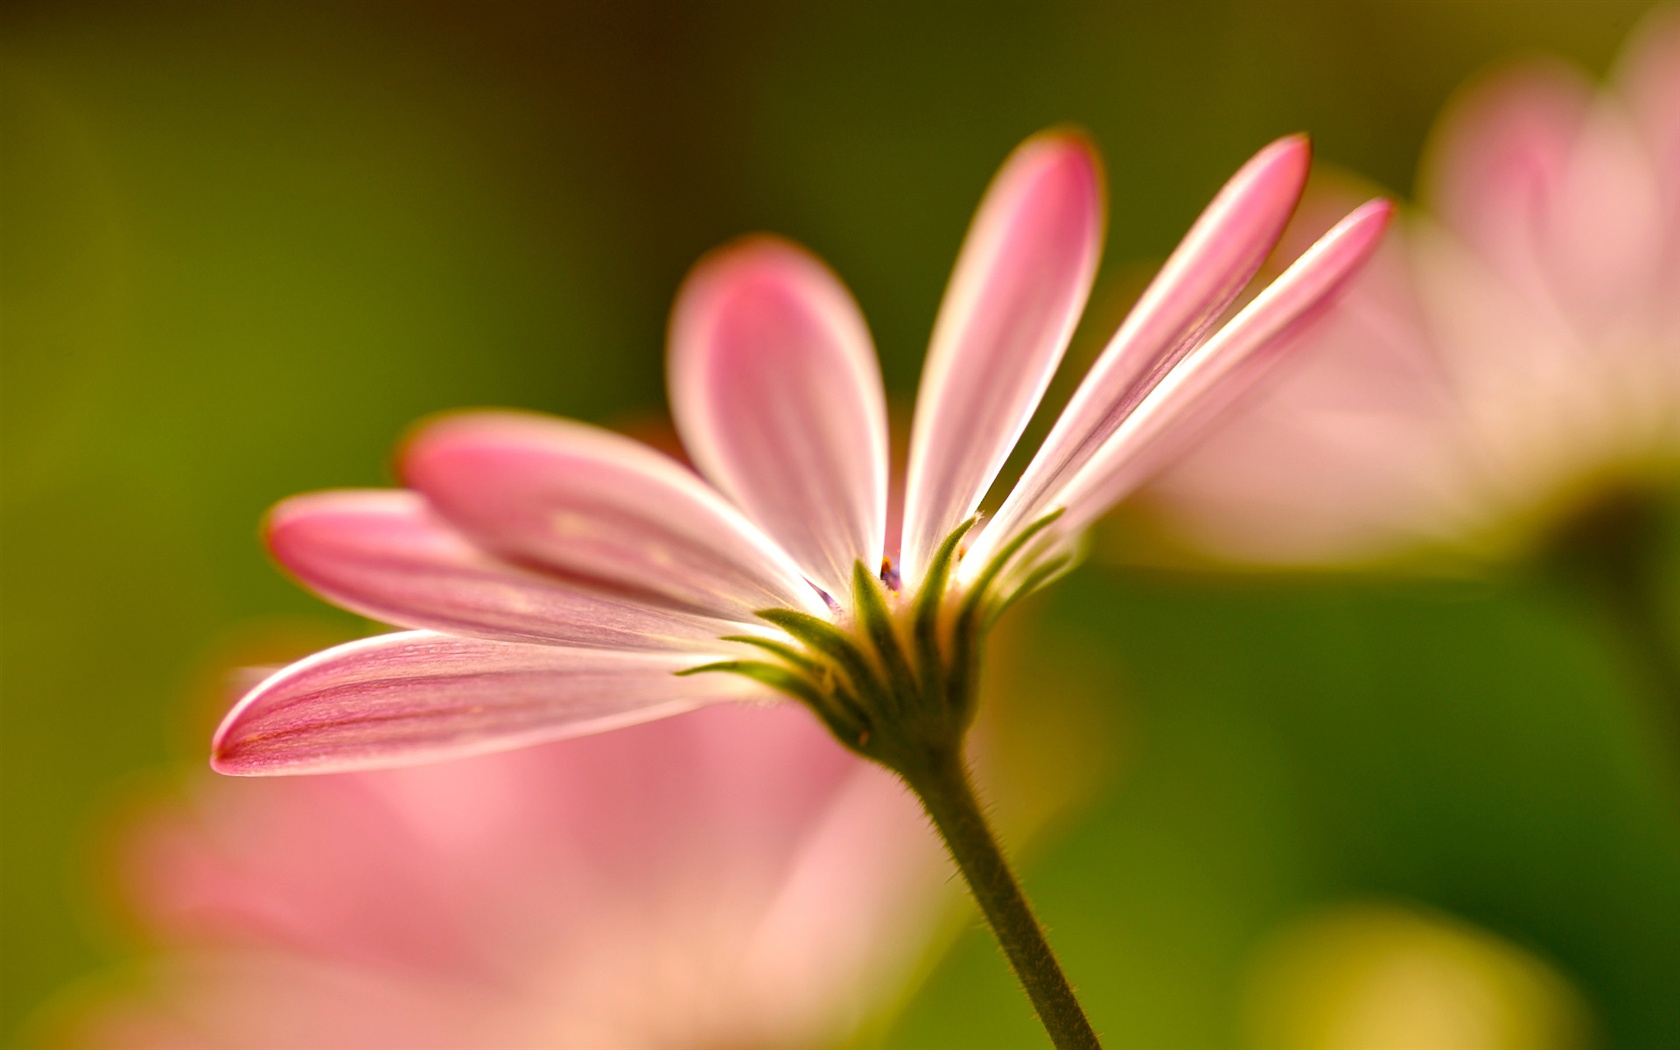 Pink-flower-petals-macro-photography_1680x1050